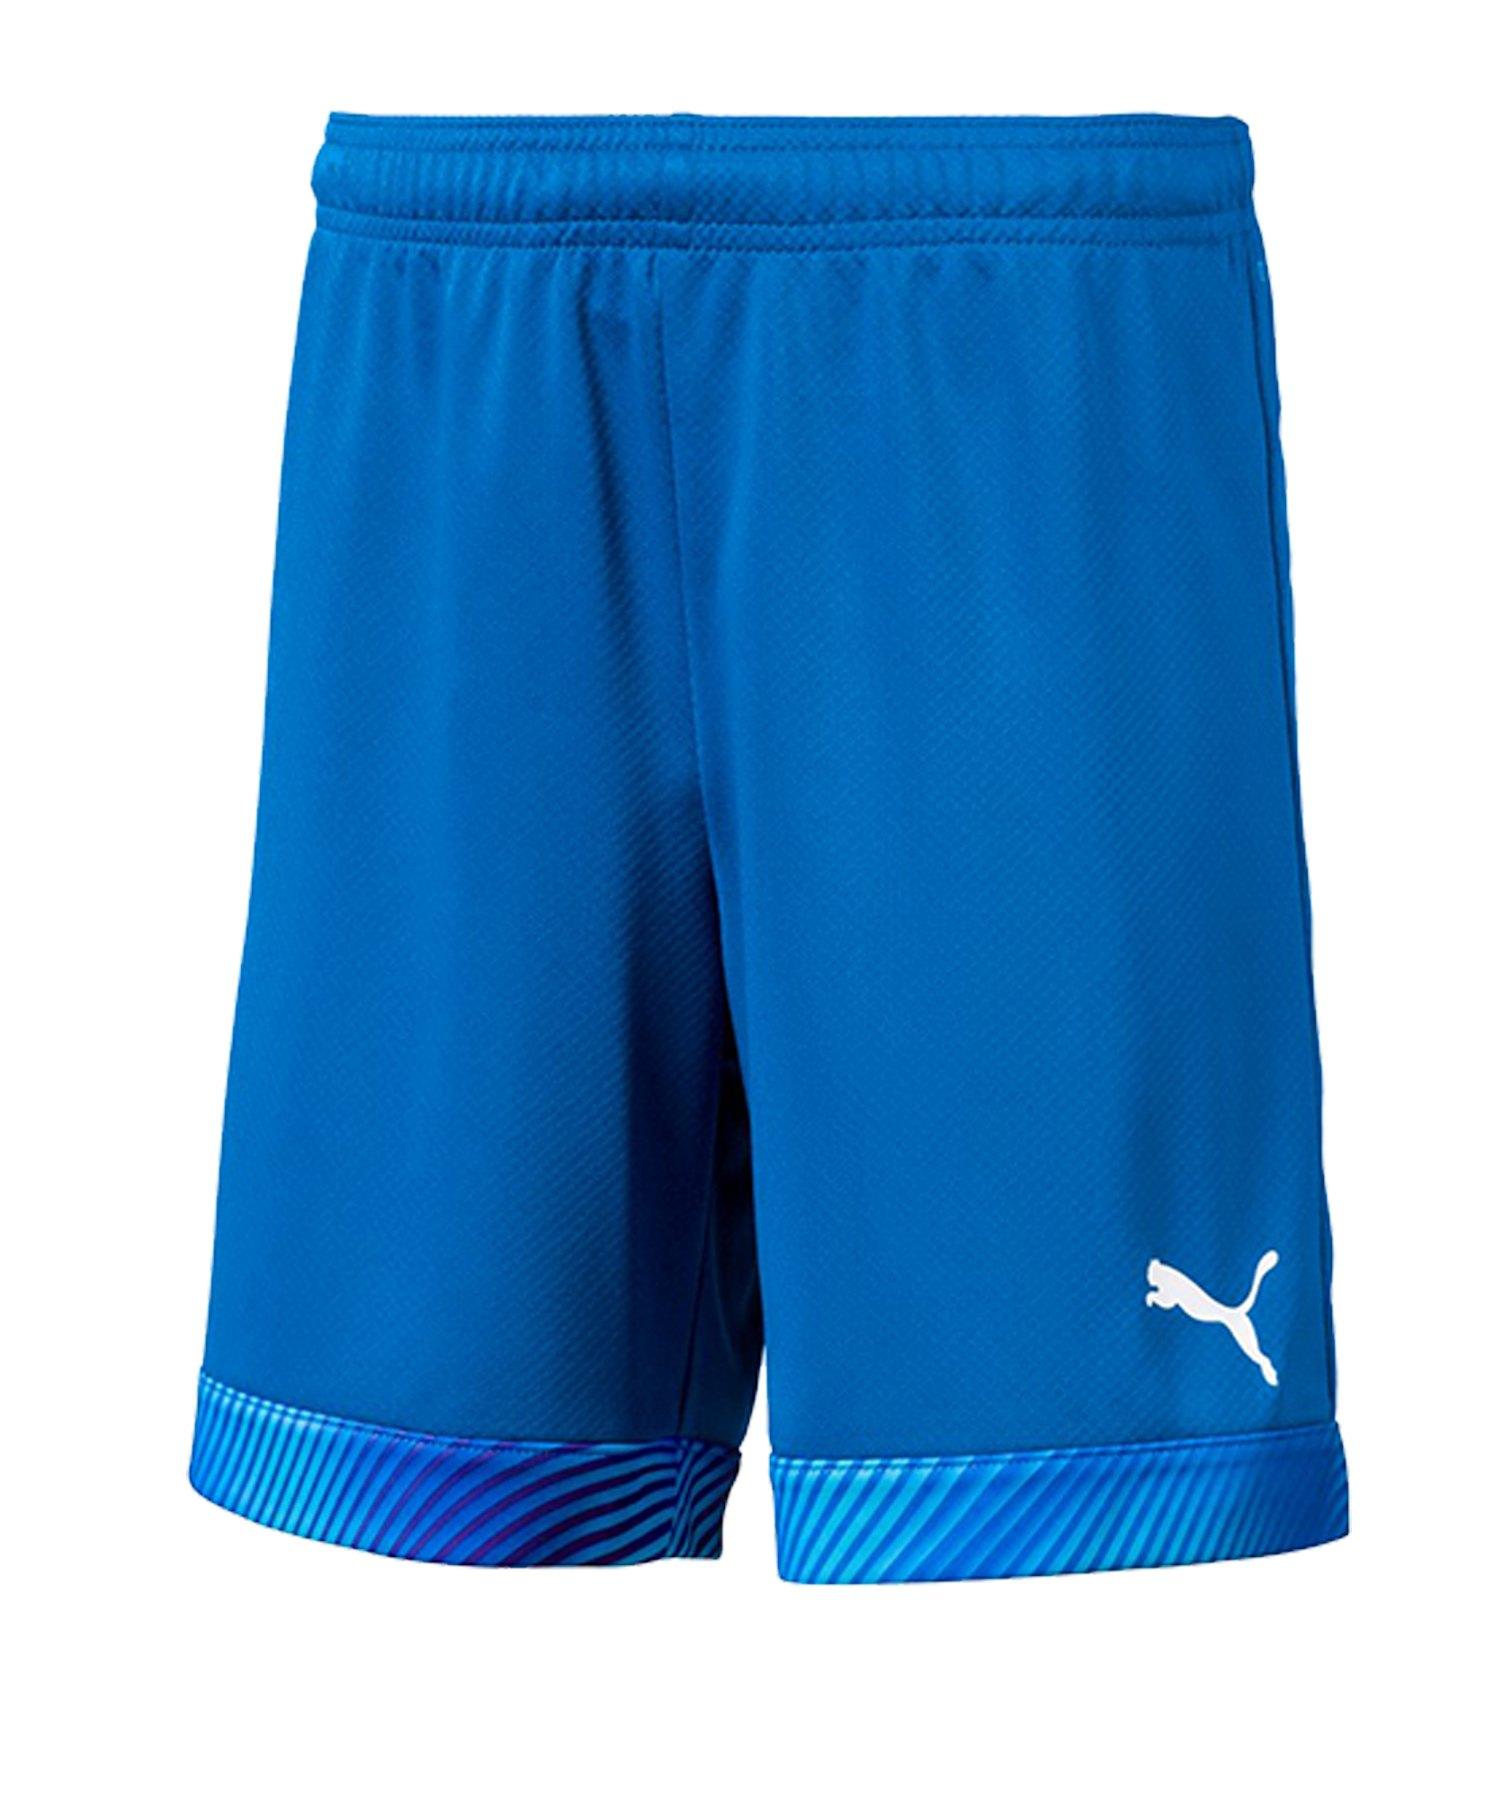 PUMA CUP Short Kids Blau Weiss F02 - blau